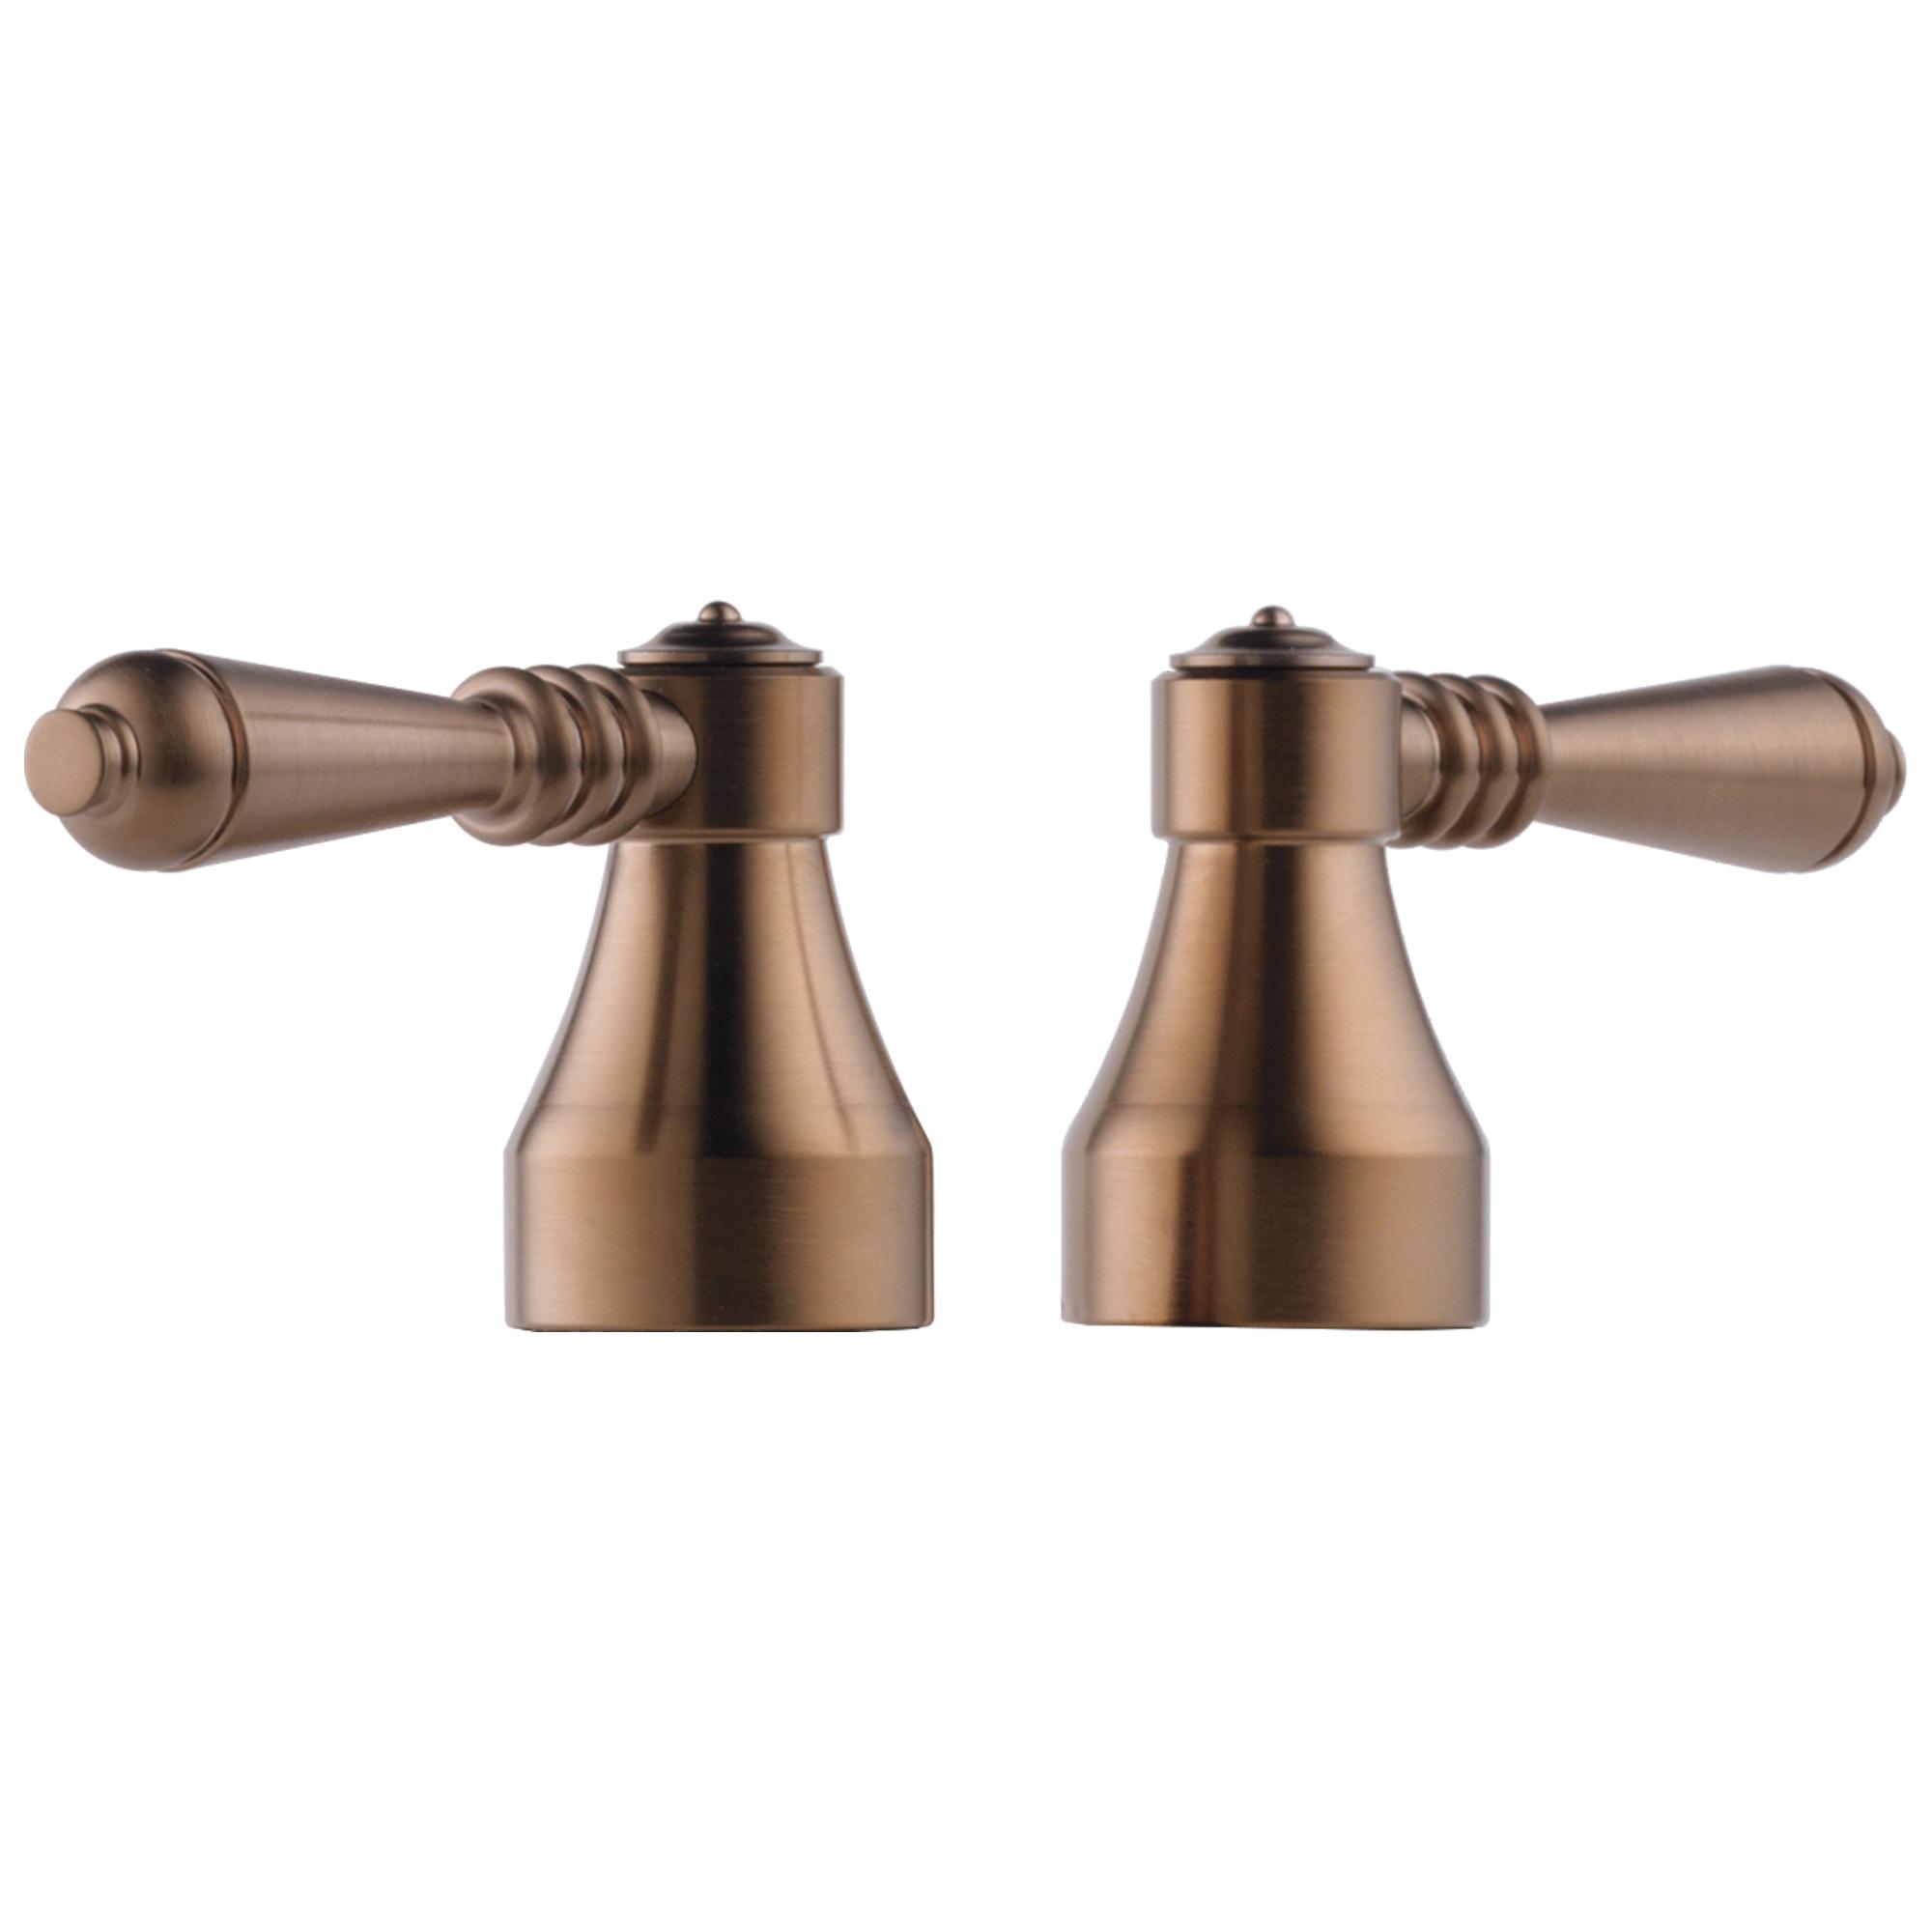 Brizo® RP52831BZ Tresa® Single Lavatory Faucet Lever Handle Kit, Metal, Brilliance® Brushed Bronze, Domestic